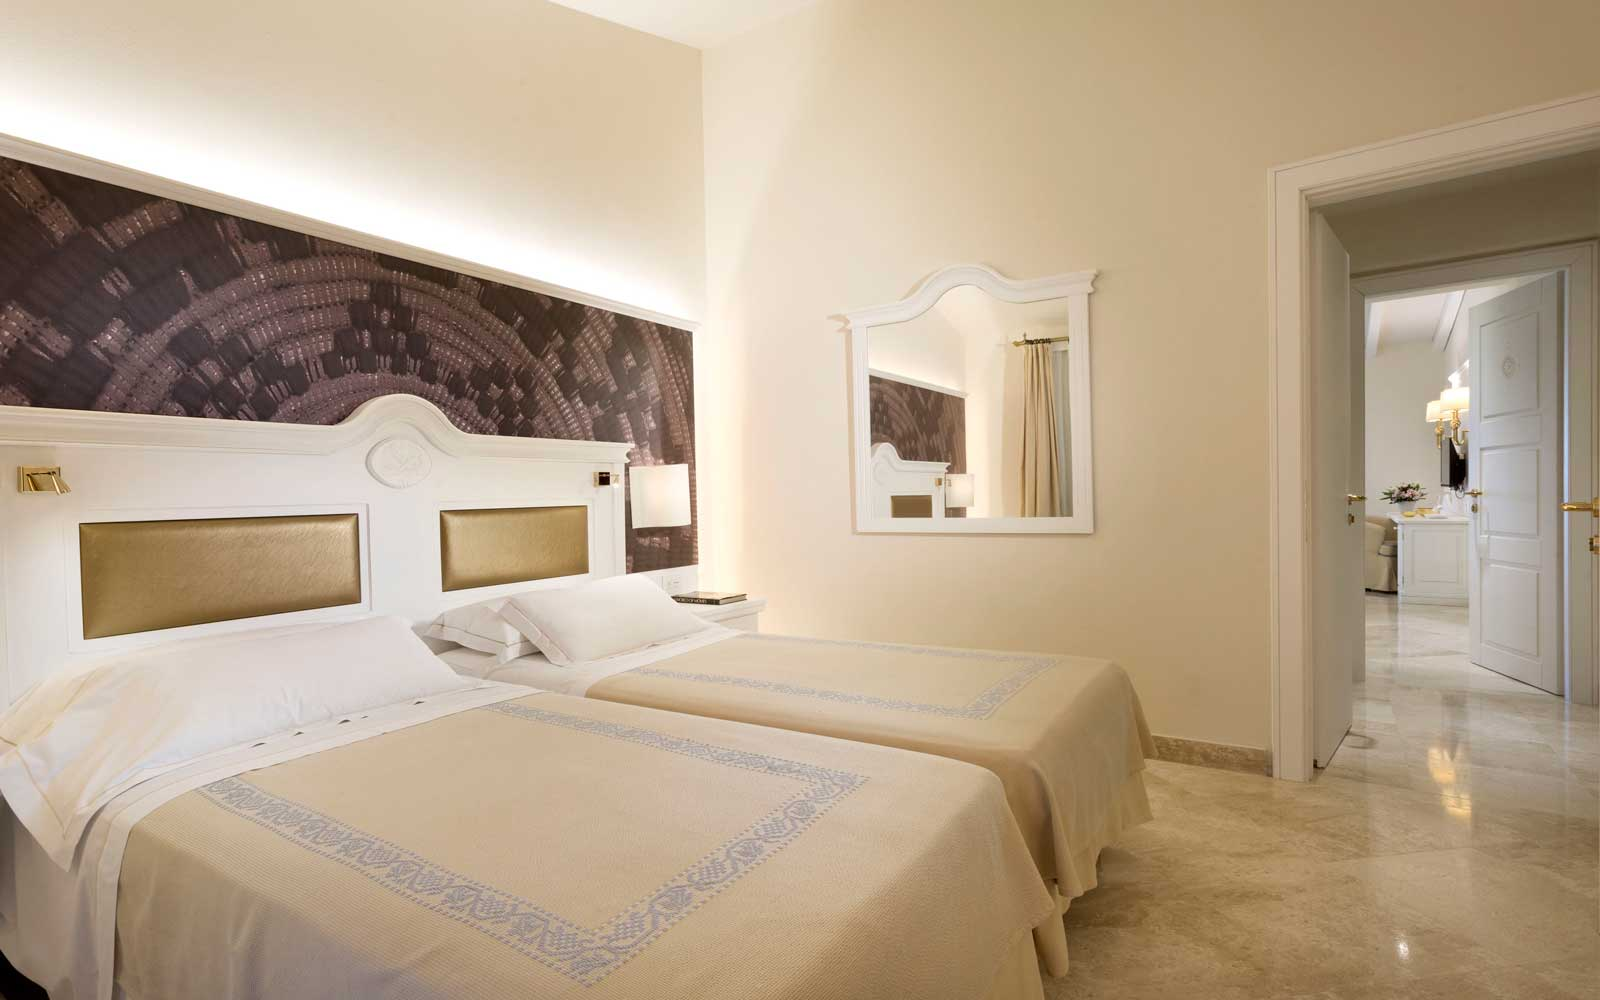 Premium Room at Hotel Abi D'oru